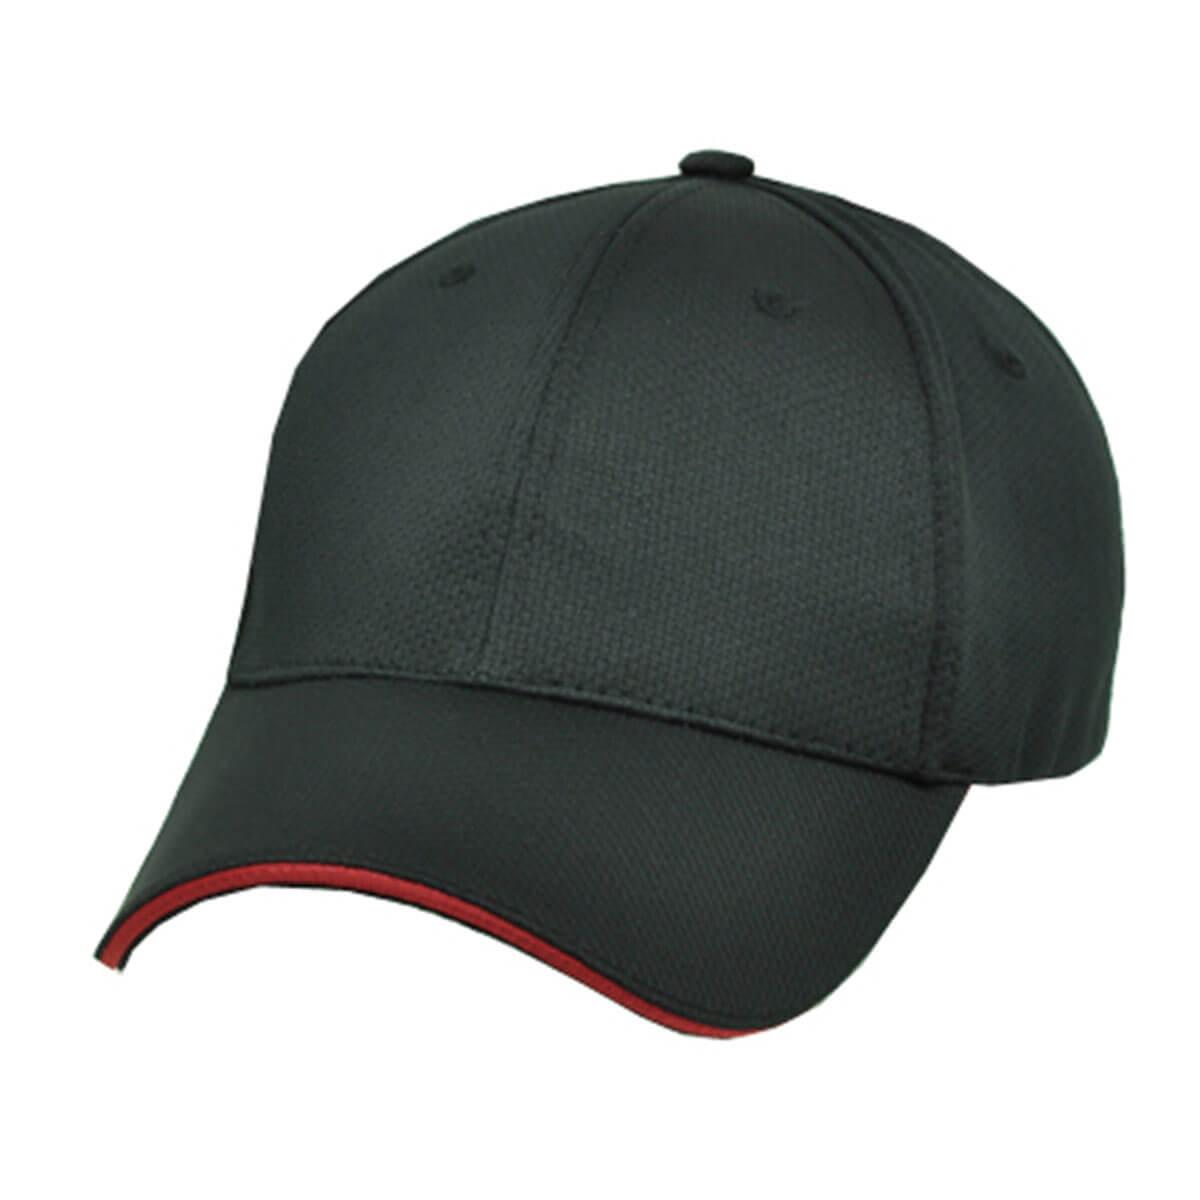 100% RPET Cap-Black / Red